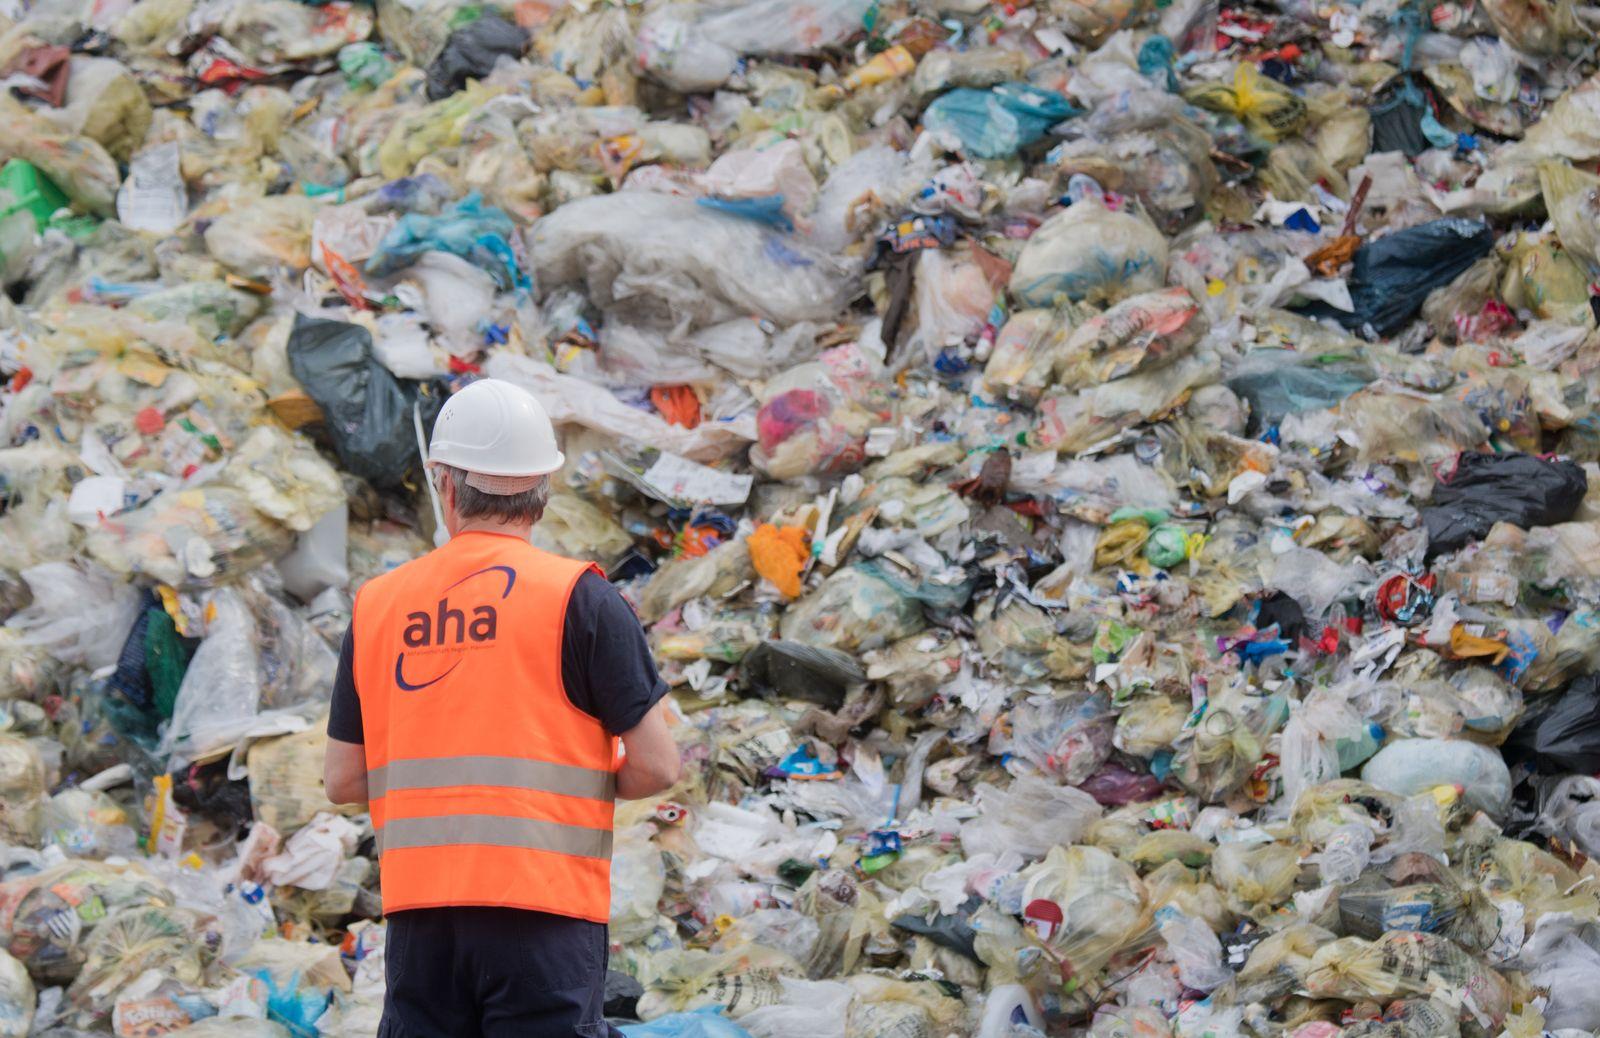 Plastik Deponie Hannover